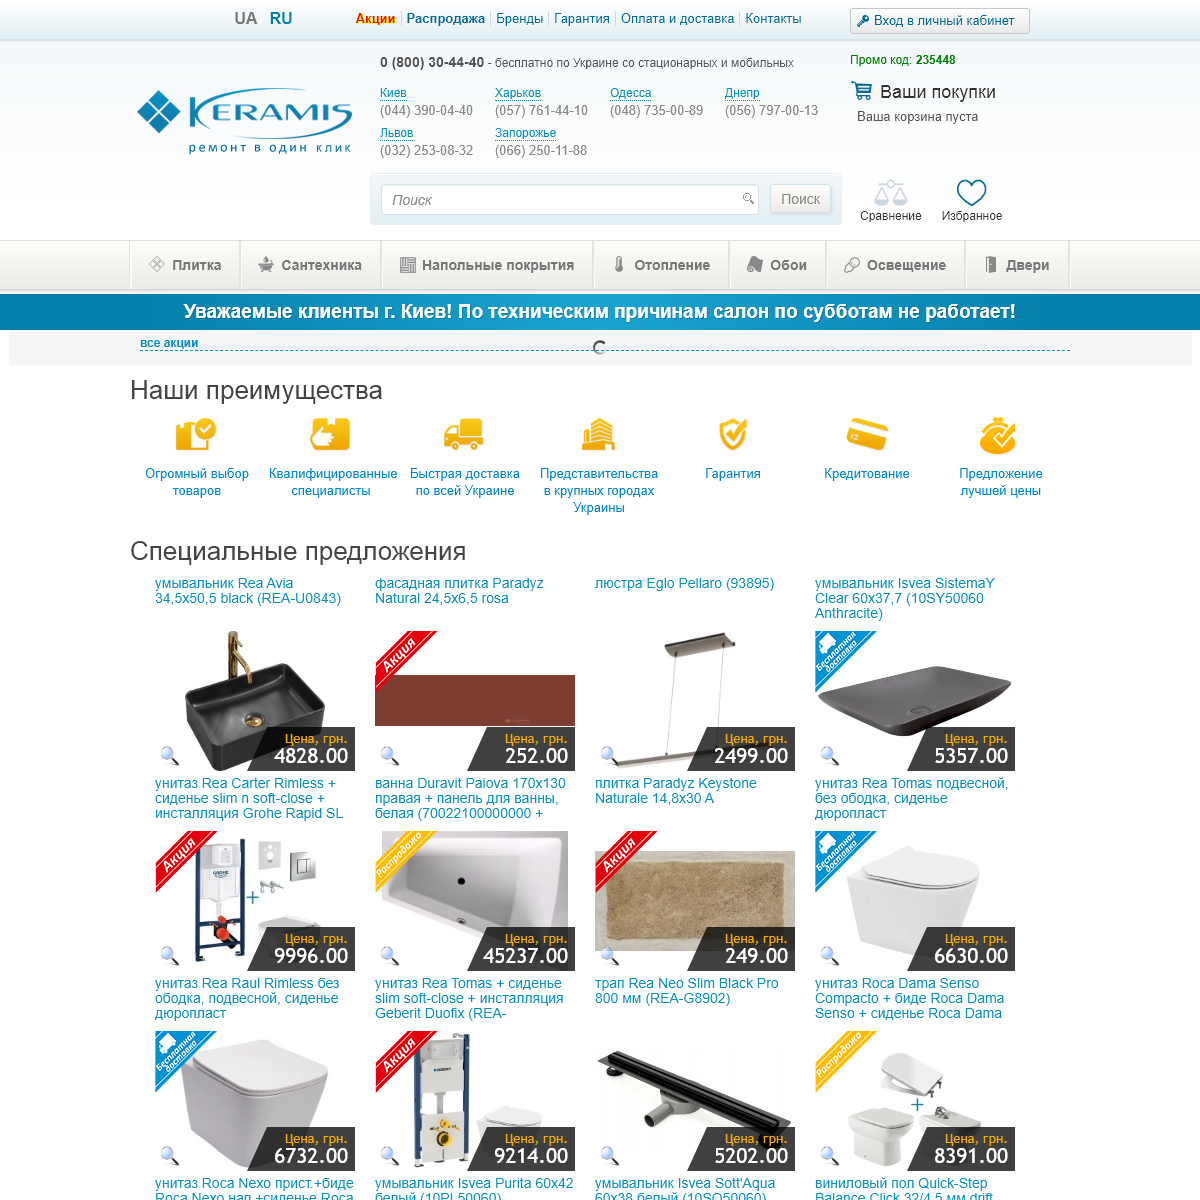 Керамис - интернет магазин плитки и сантехники